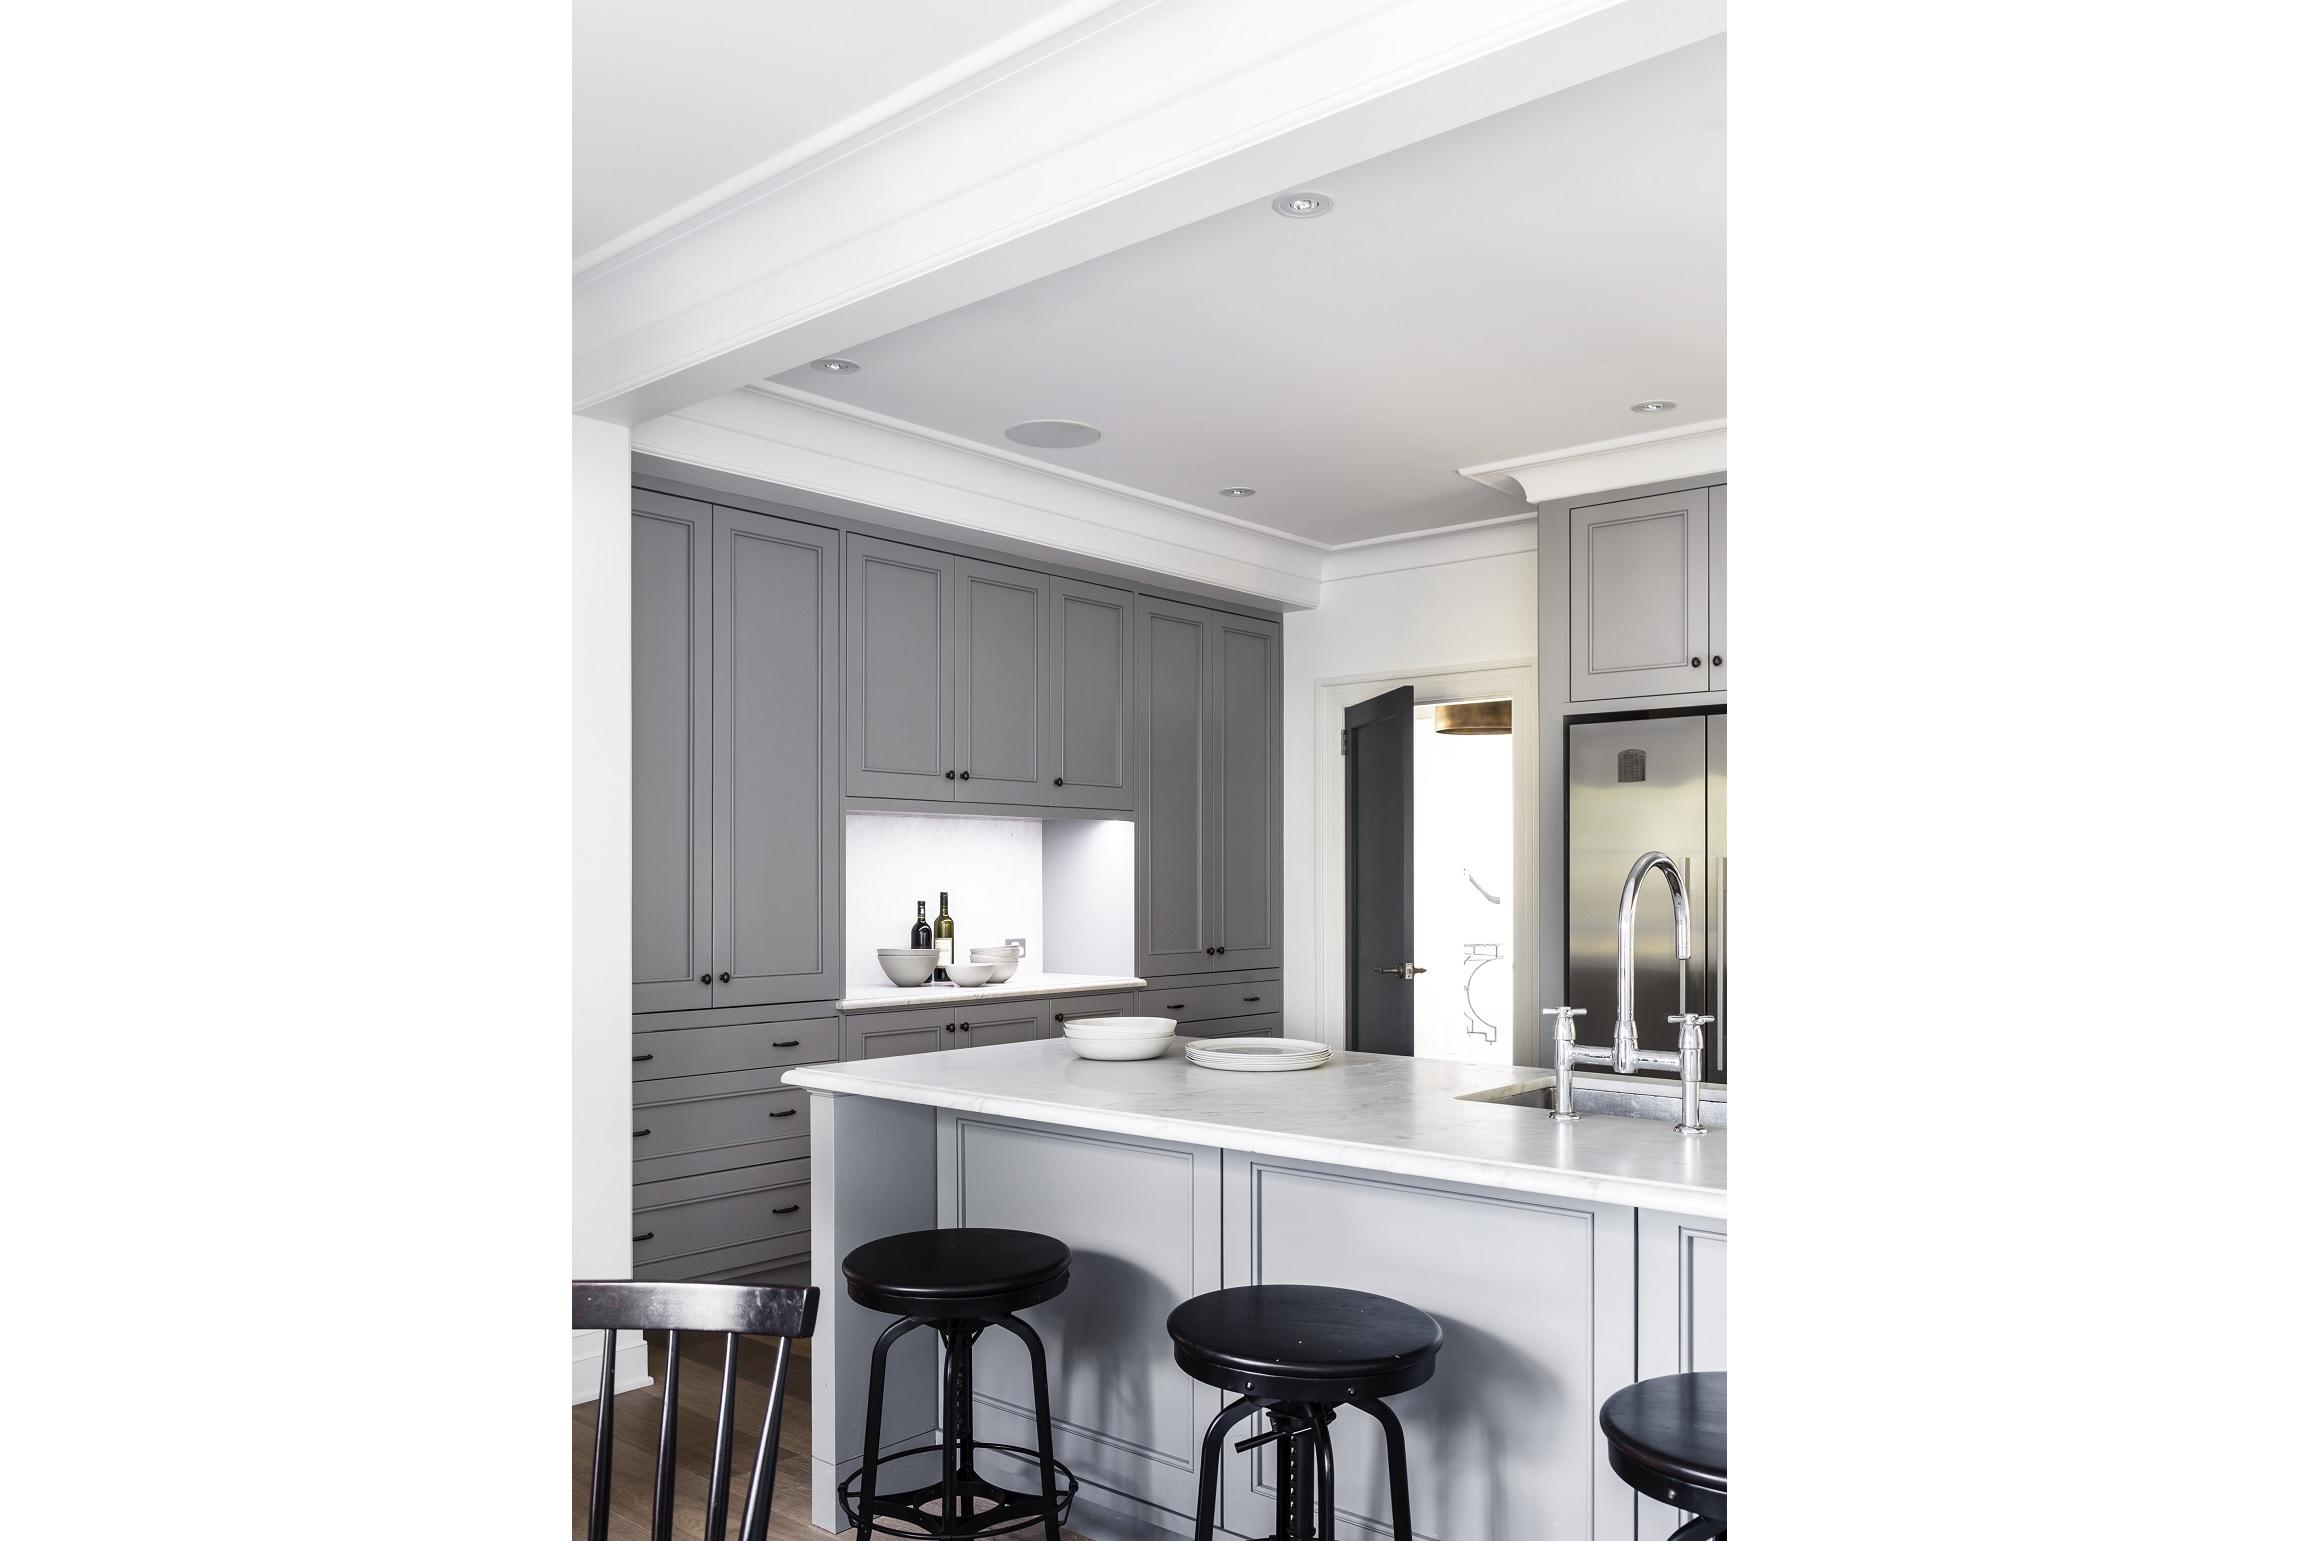 Art-Deco-Interior-Design-Kitchen-Counter-Bellevue-Hill-Michael-Bell-Architects